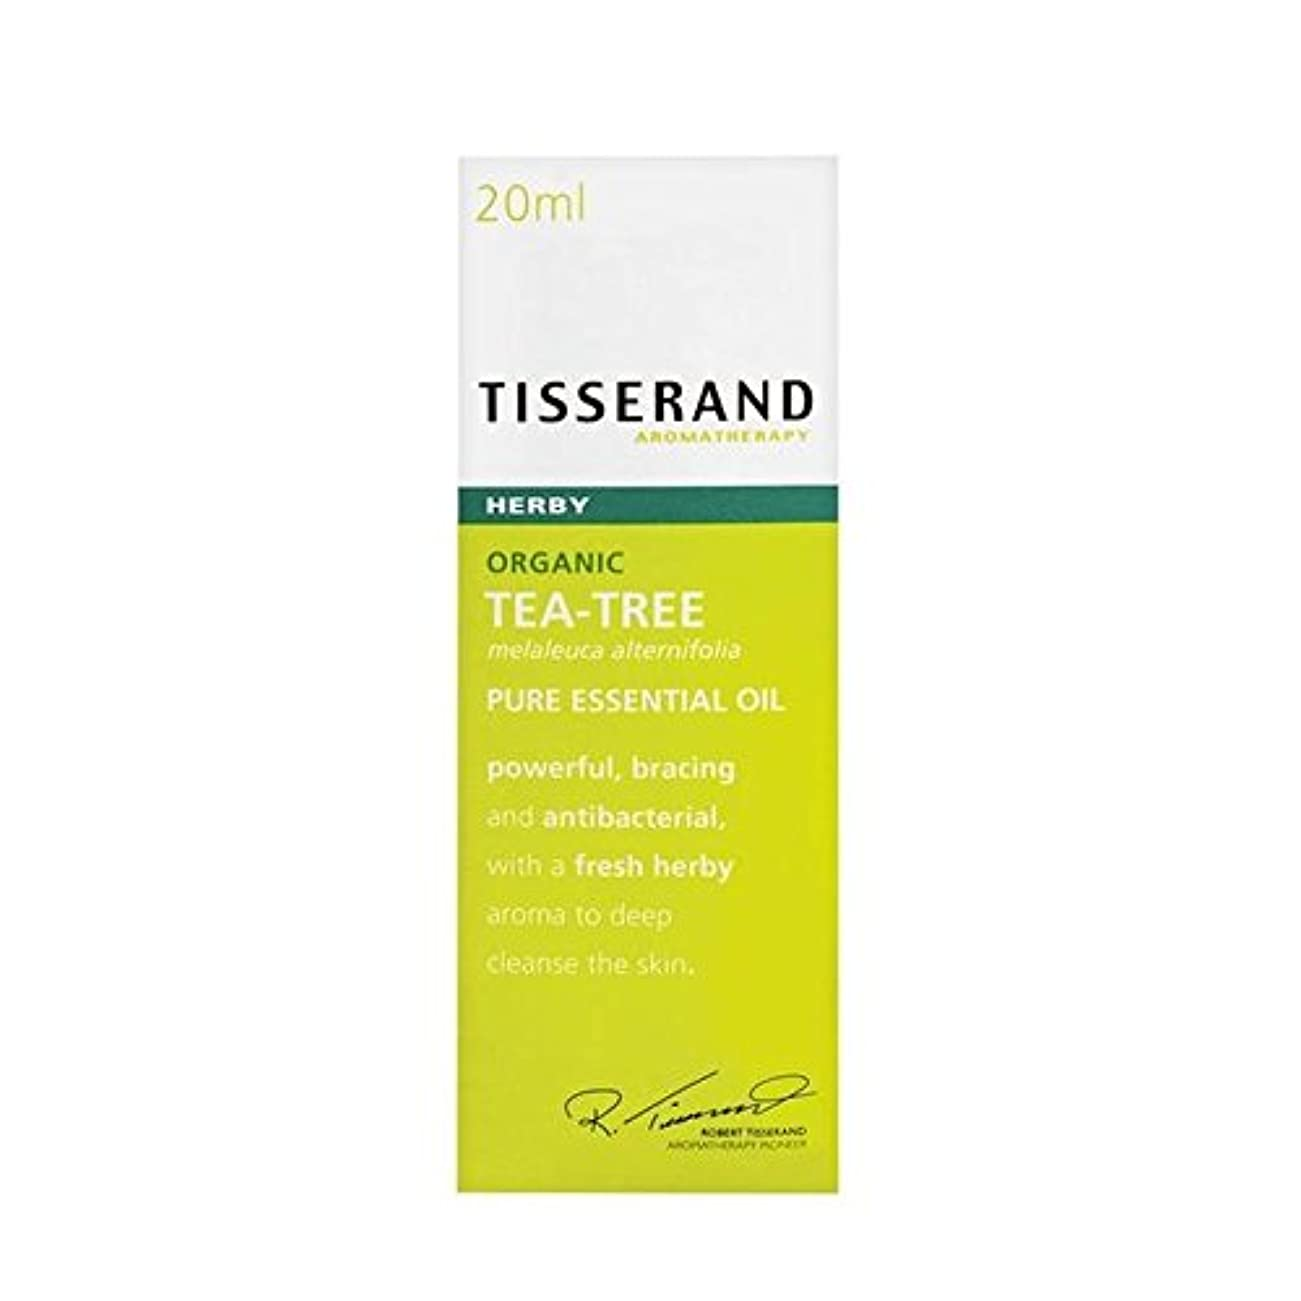 Tisserand Tea Tree Organic Pure Essential Oil 20ml - ティスランドティーツリーオーガニックピュアエッセンシャルオイル20ミリリットル [並行輸入品]